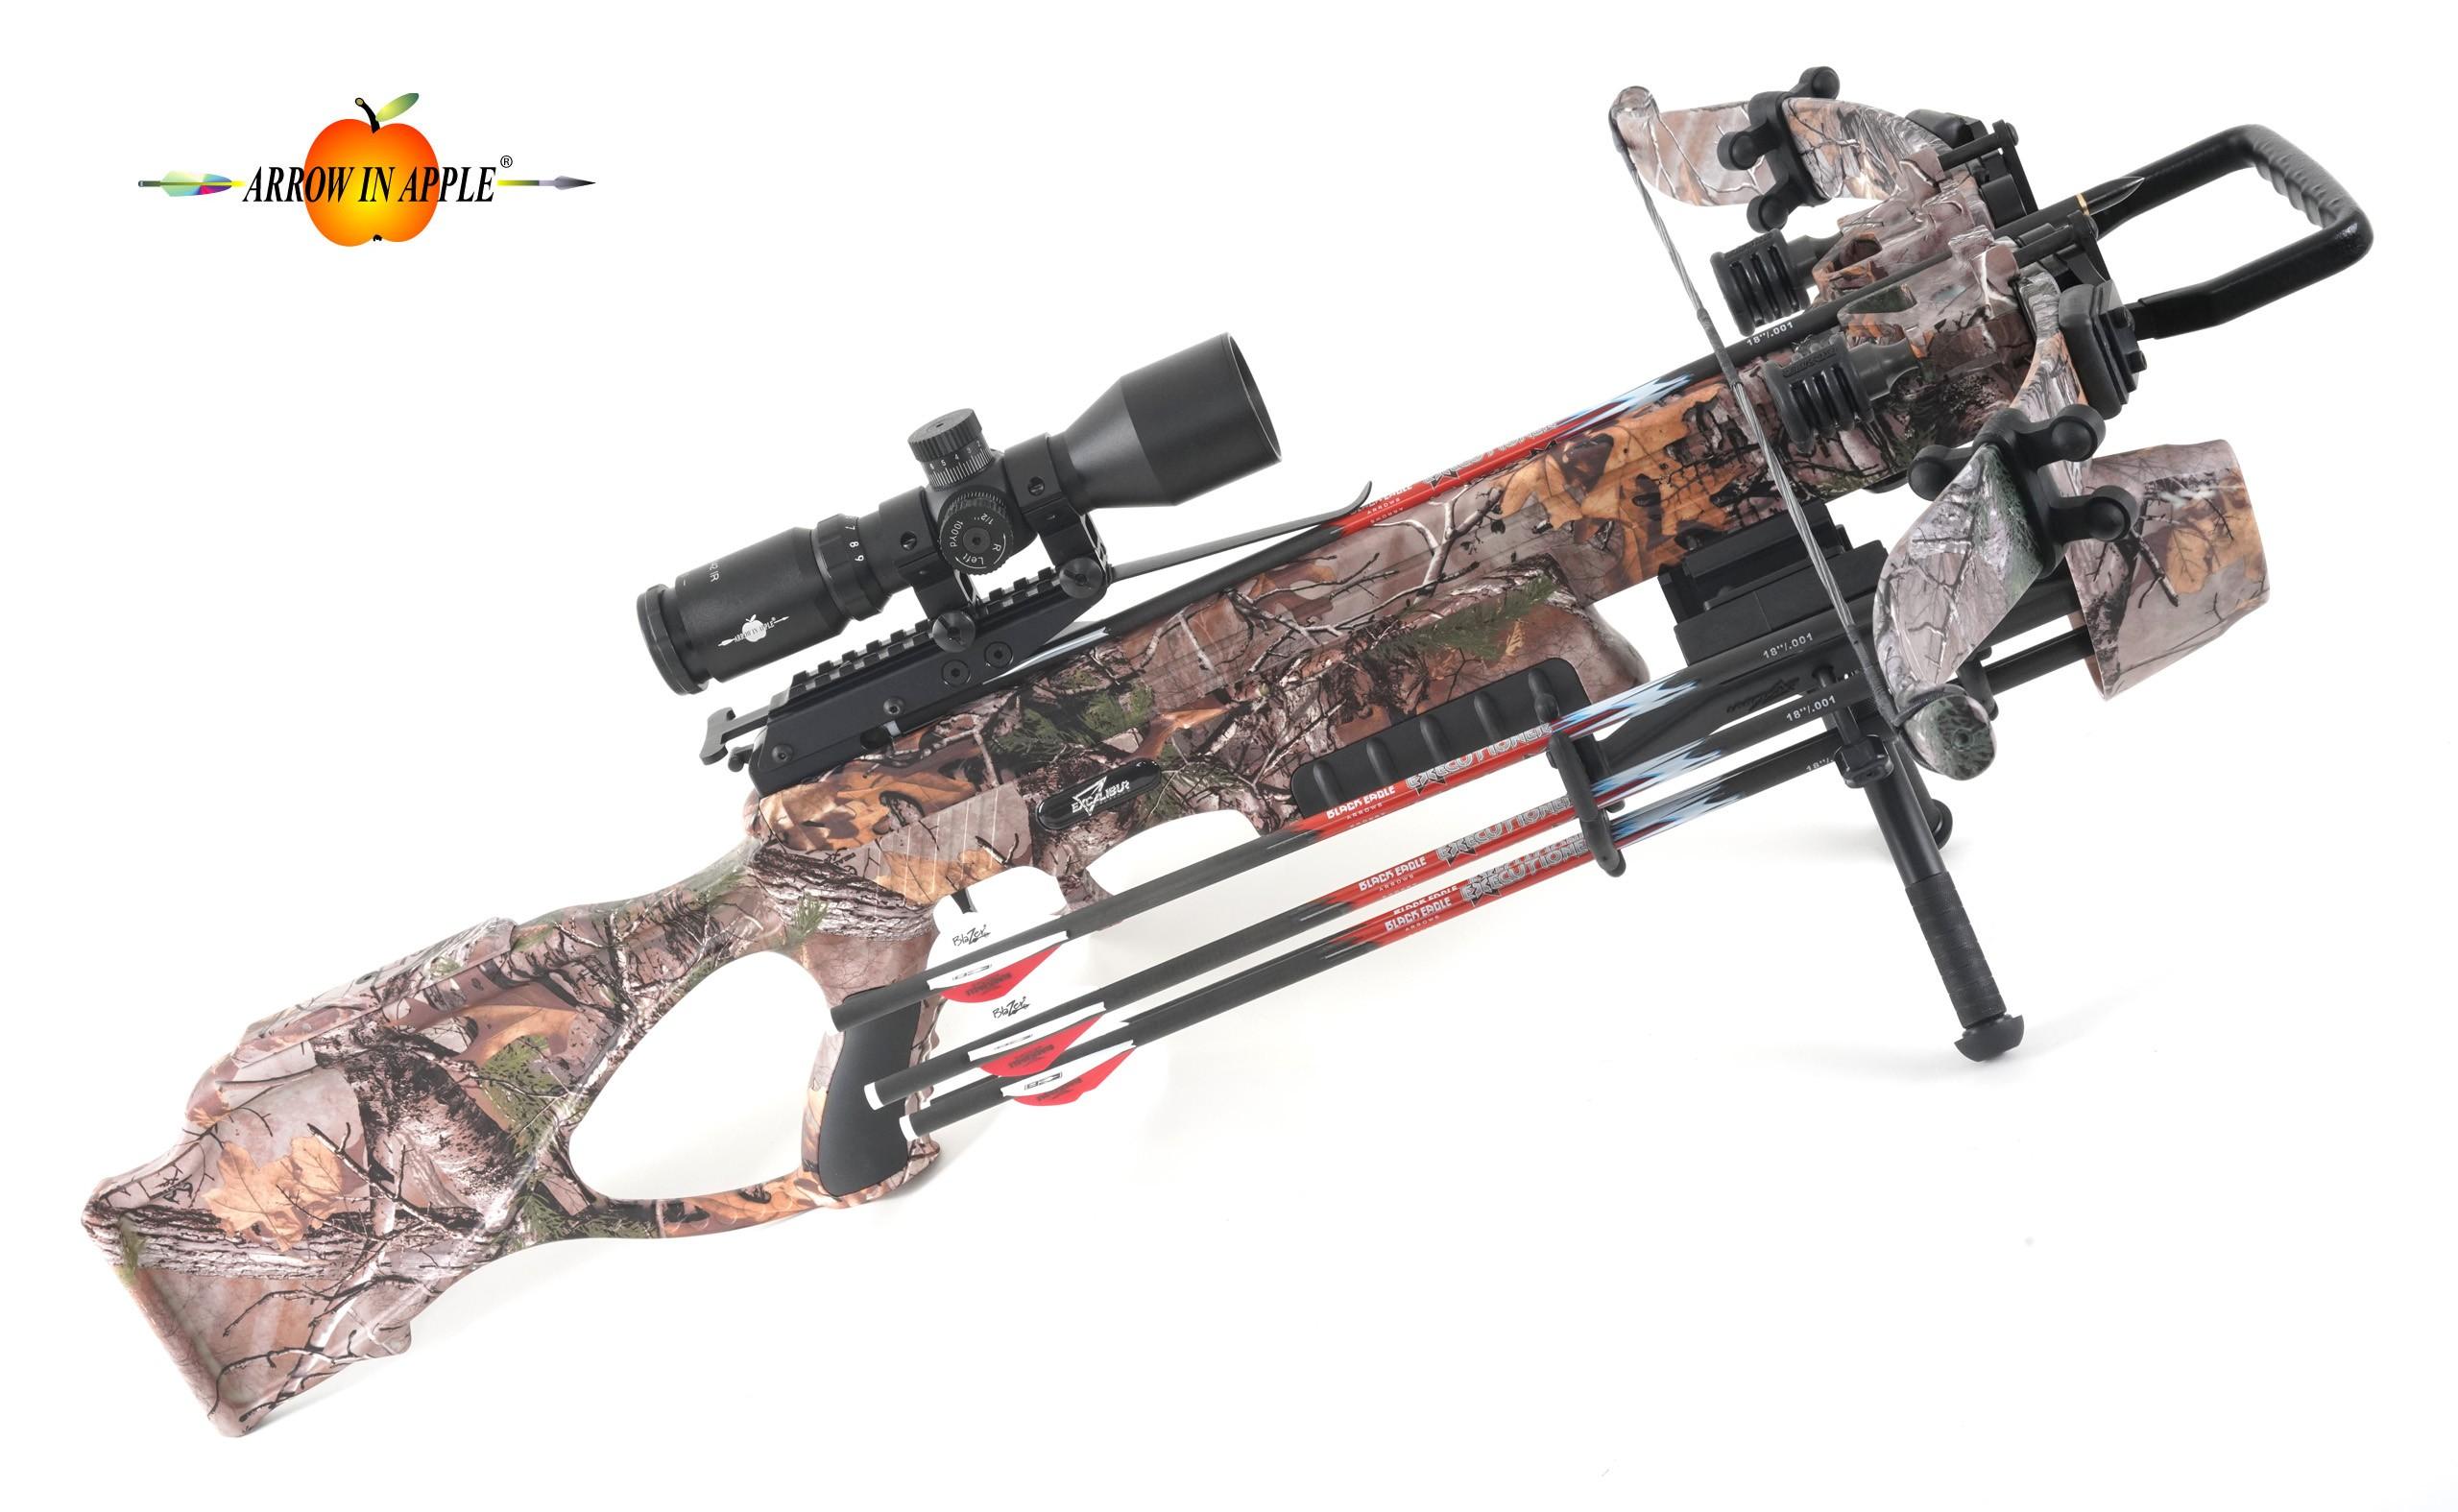 Excalibur Matrix 380,Realtree Xtra Recurve crossbow